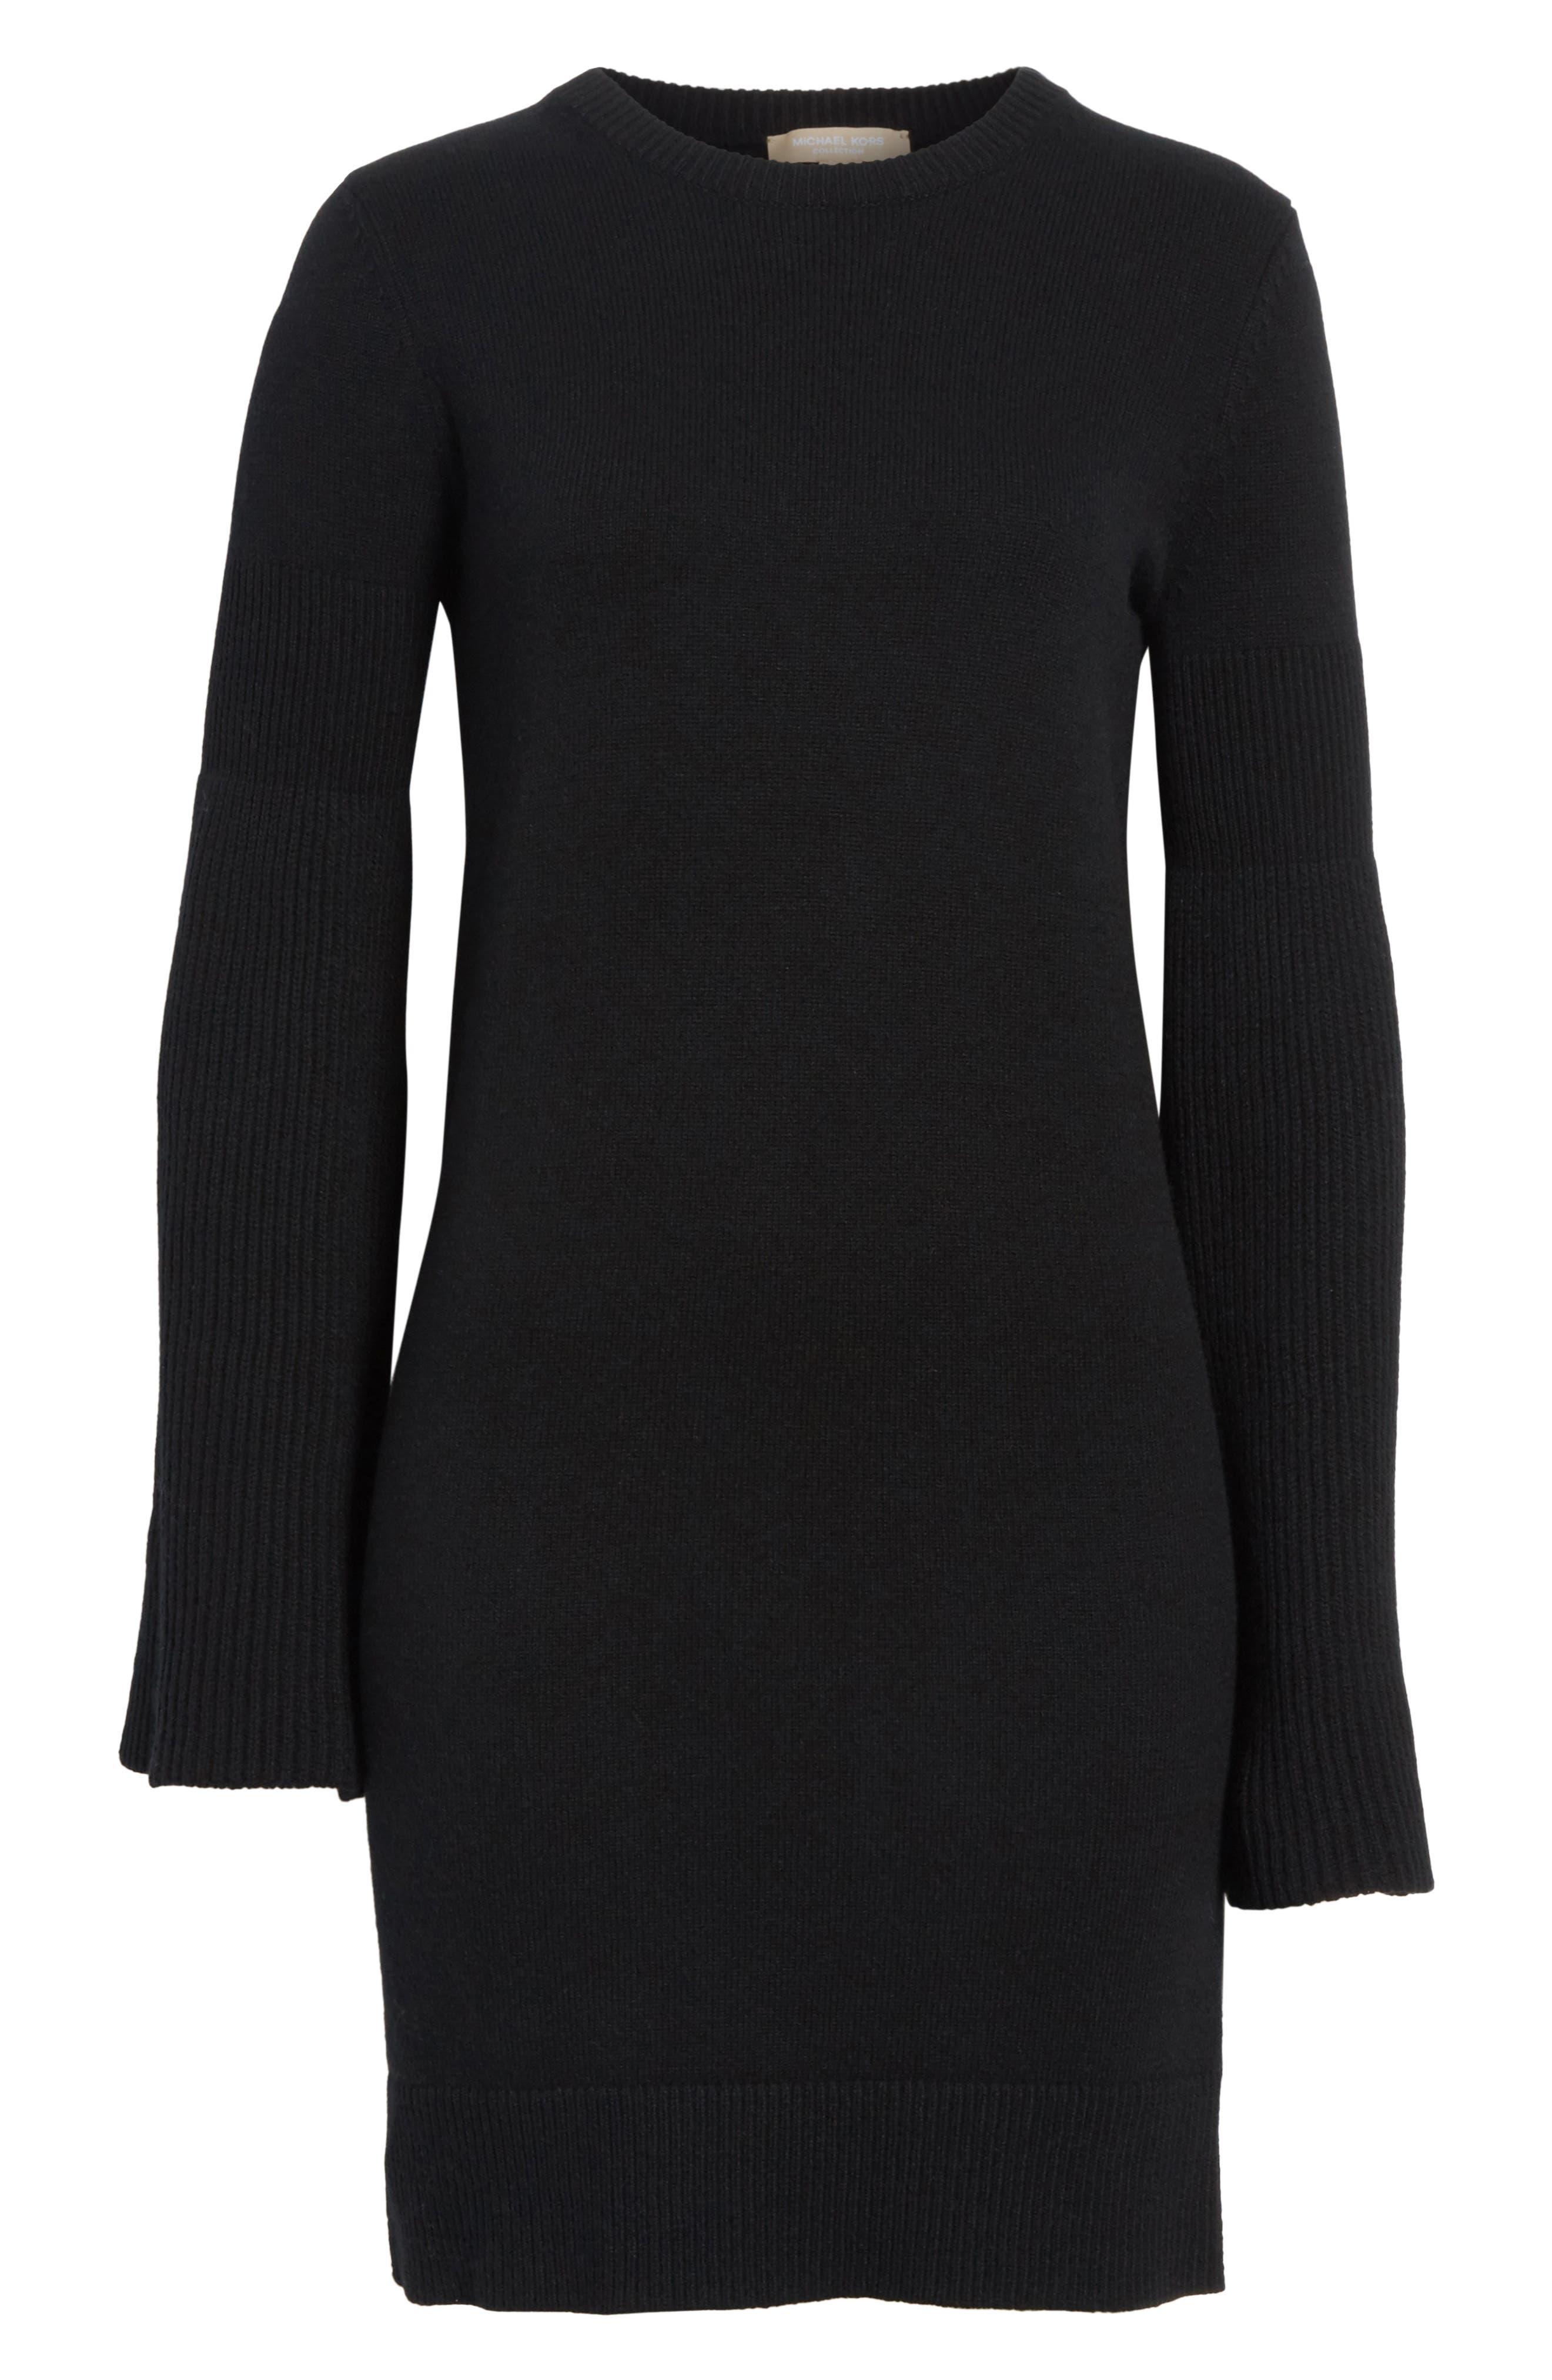 Cashmere Blend Bell Sleeve Dress,                             Alternate thumbnail 7, color,                             Black